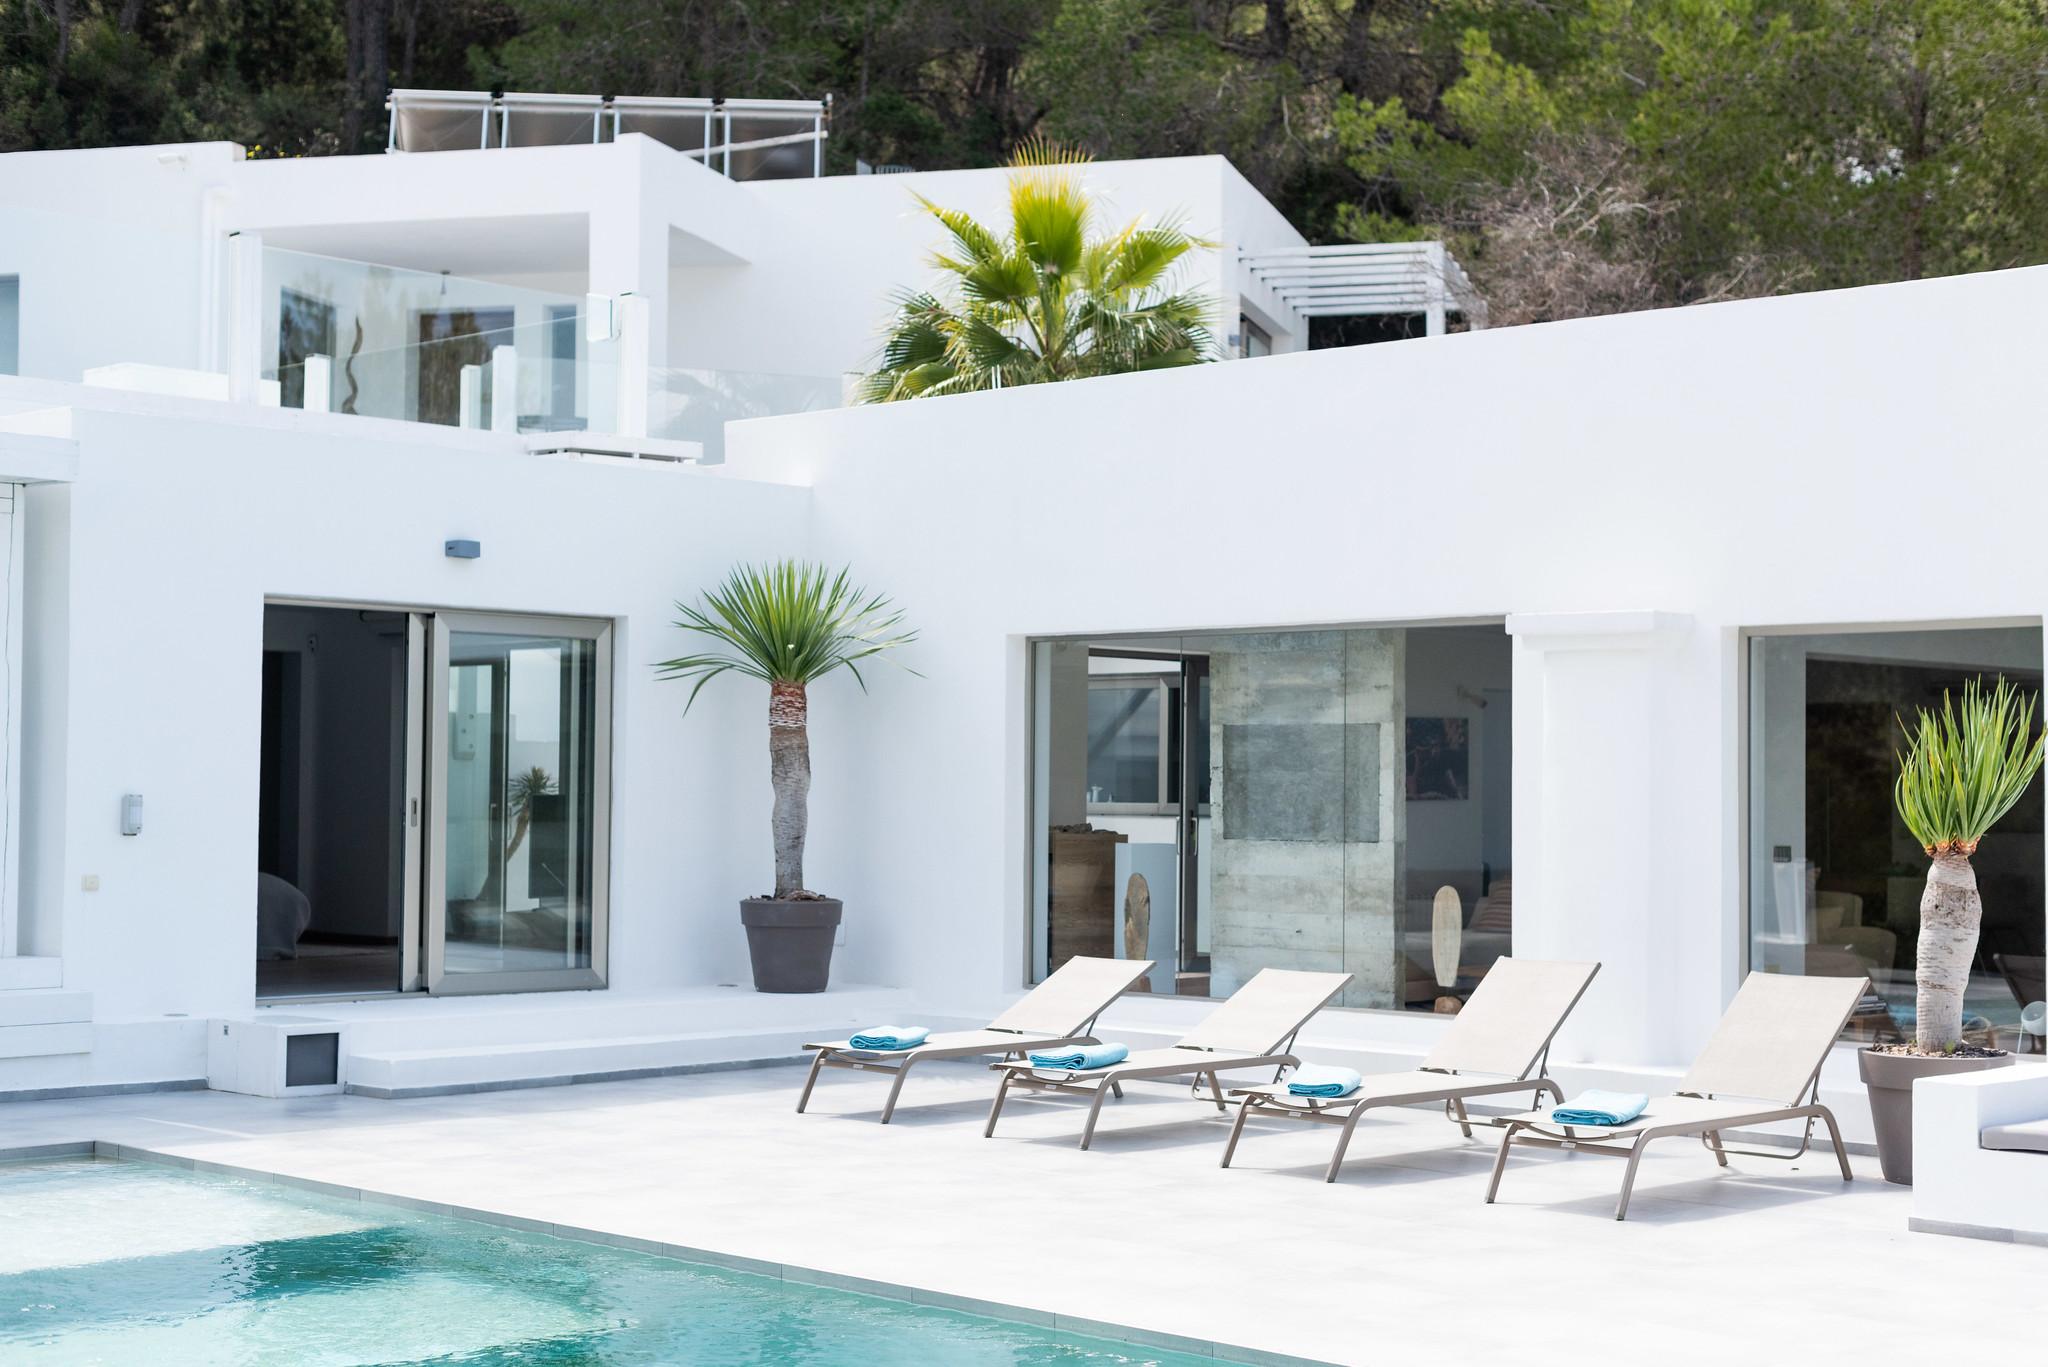 https://www.white-ibiza.com/wp-content/uploads/2020/05/white-ibiza-villas-can-dela-view-back-to-house.jpg